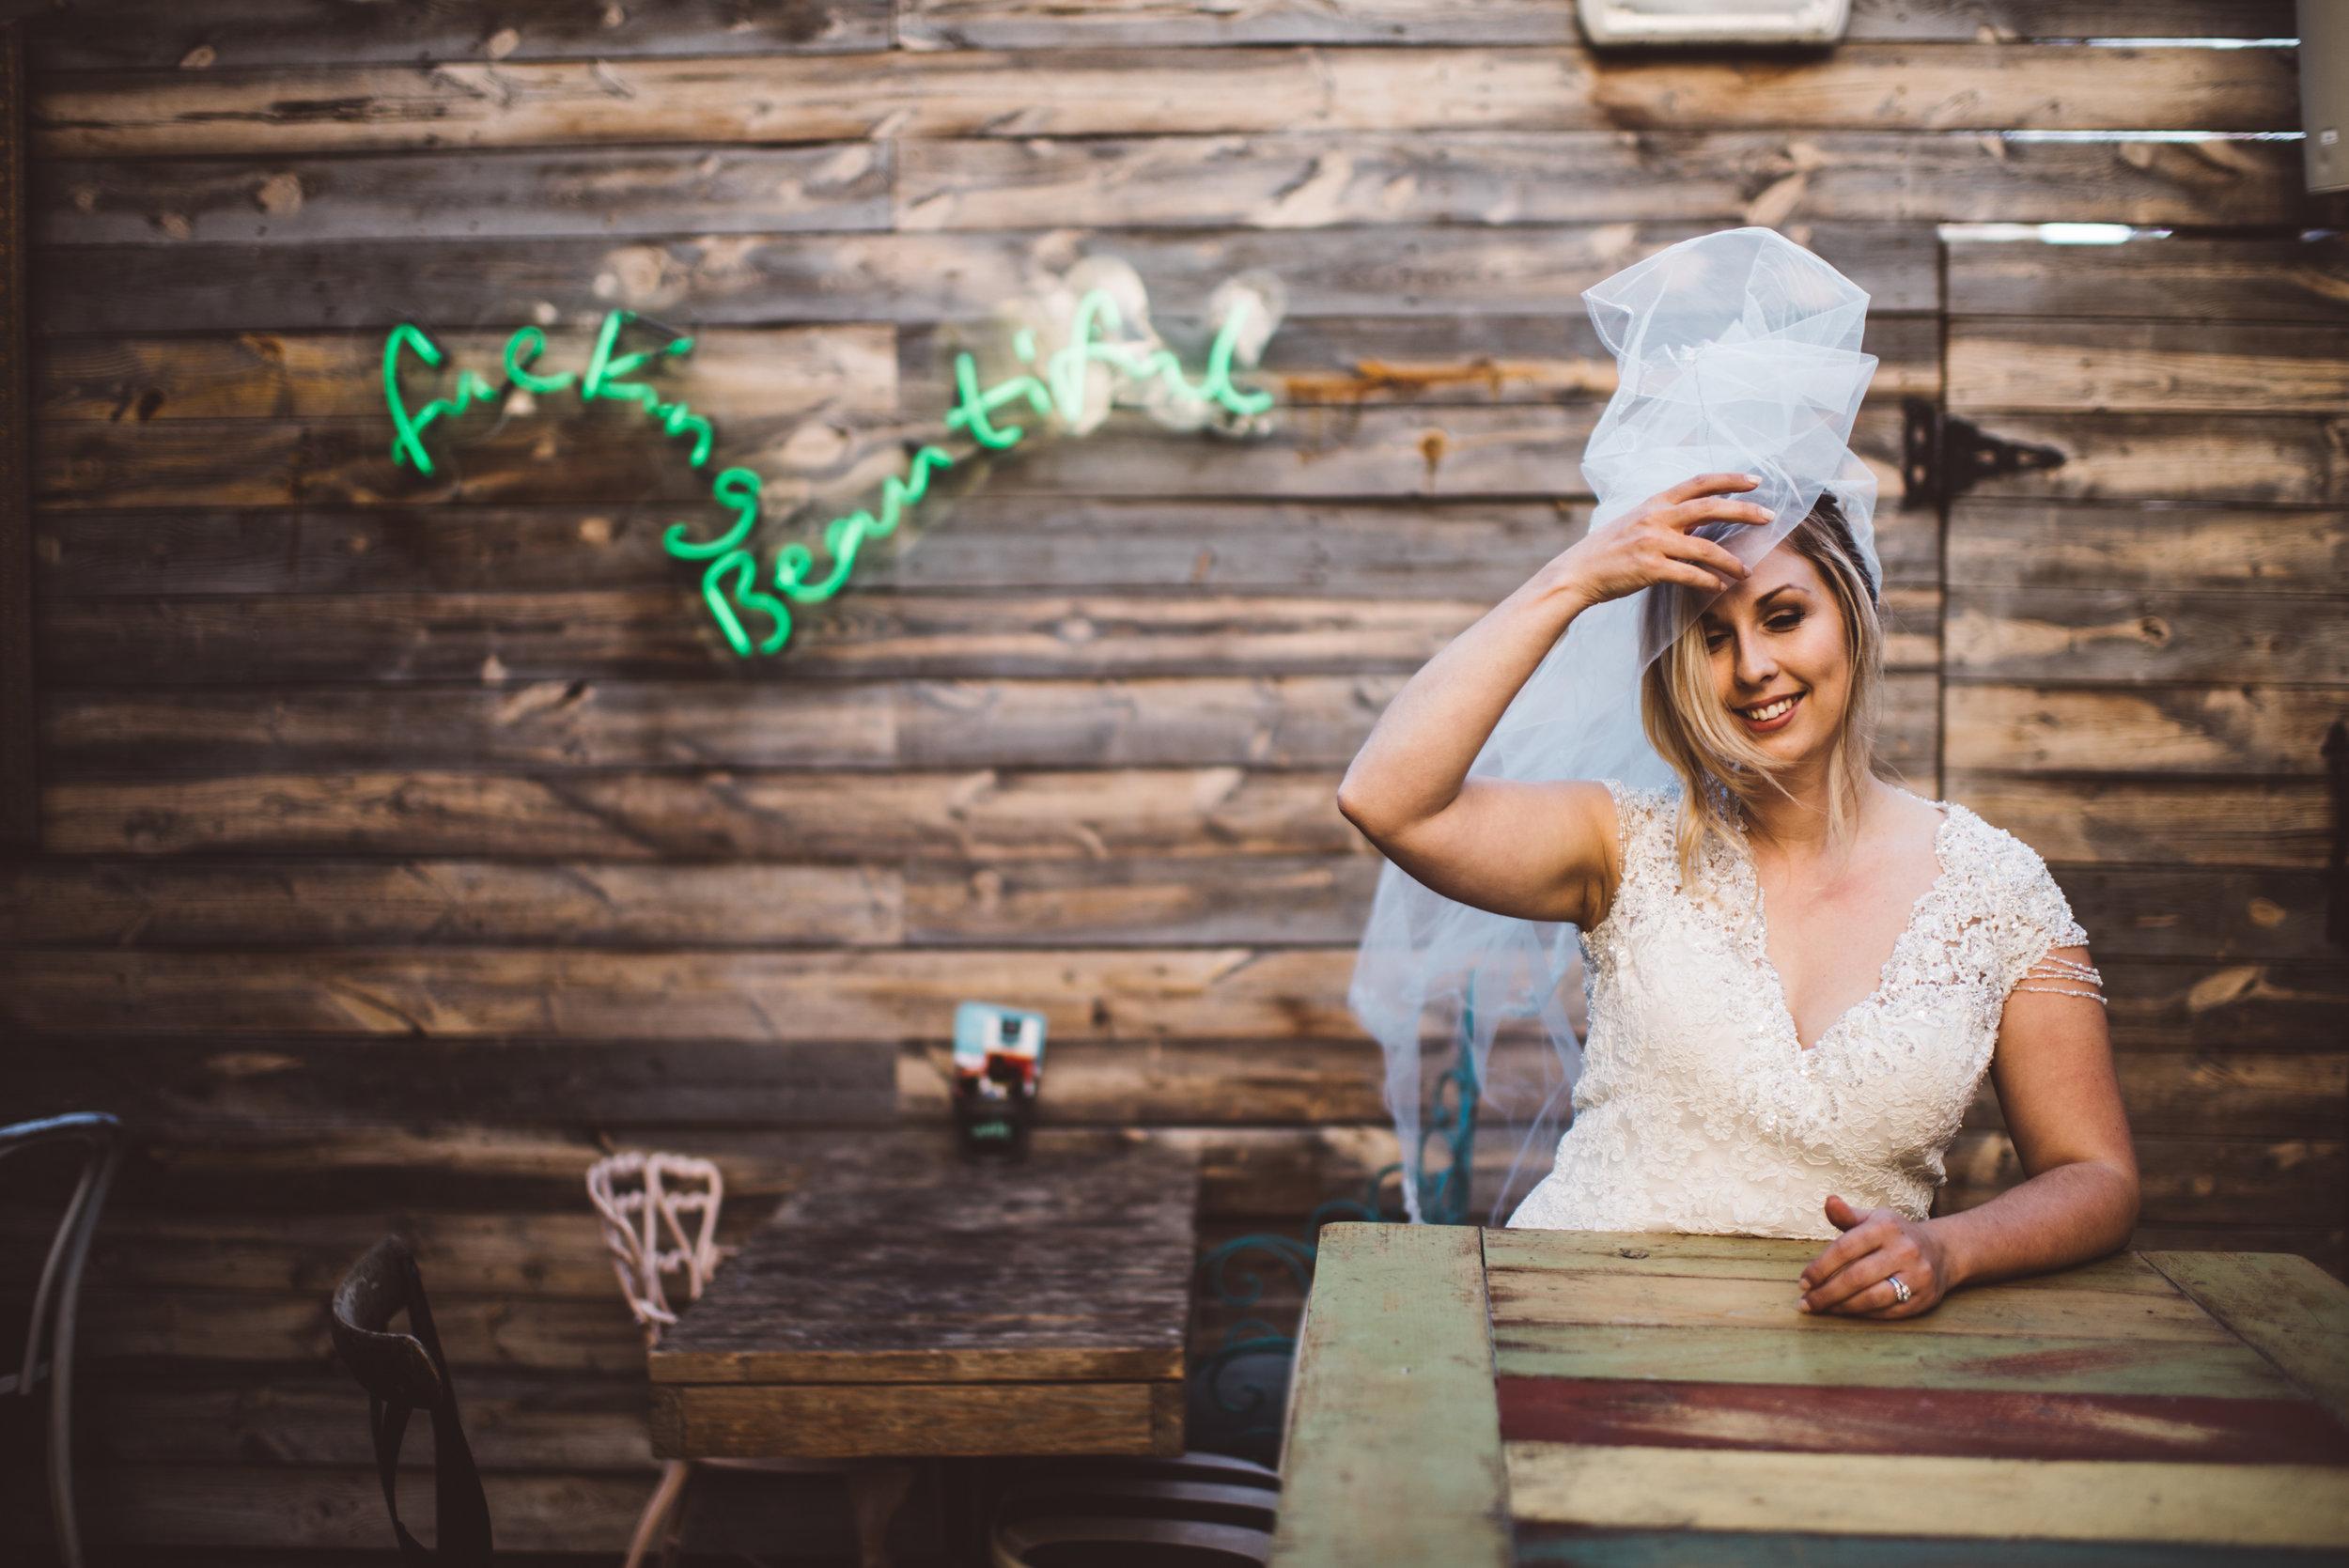 Las Vegas Elopement Photographer Ashley Marie Myers Rock'n Roll Bride-104.jpg